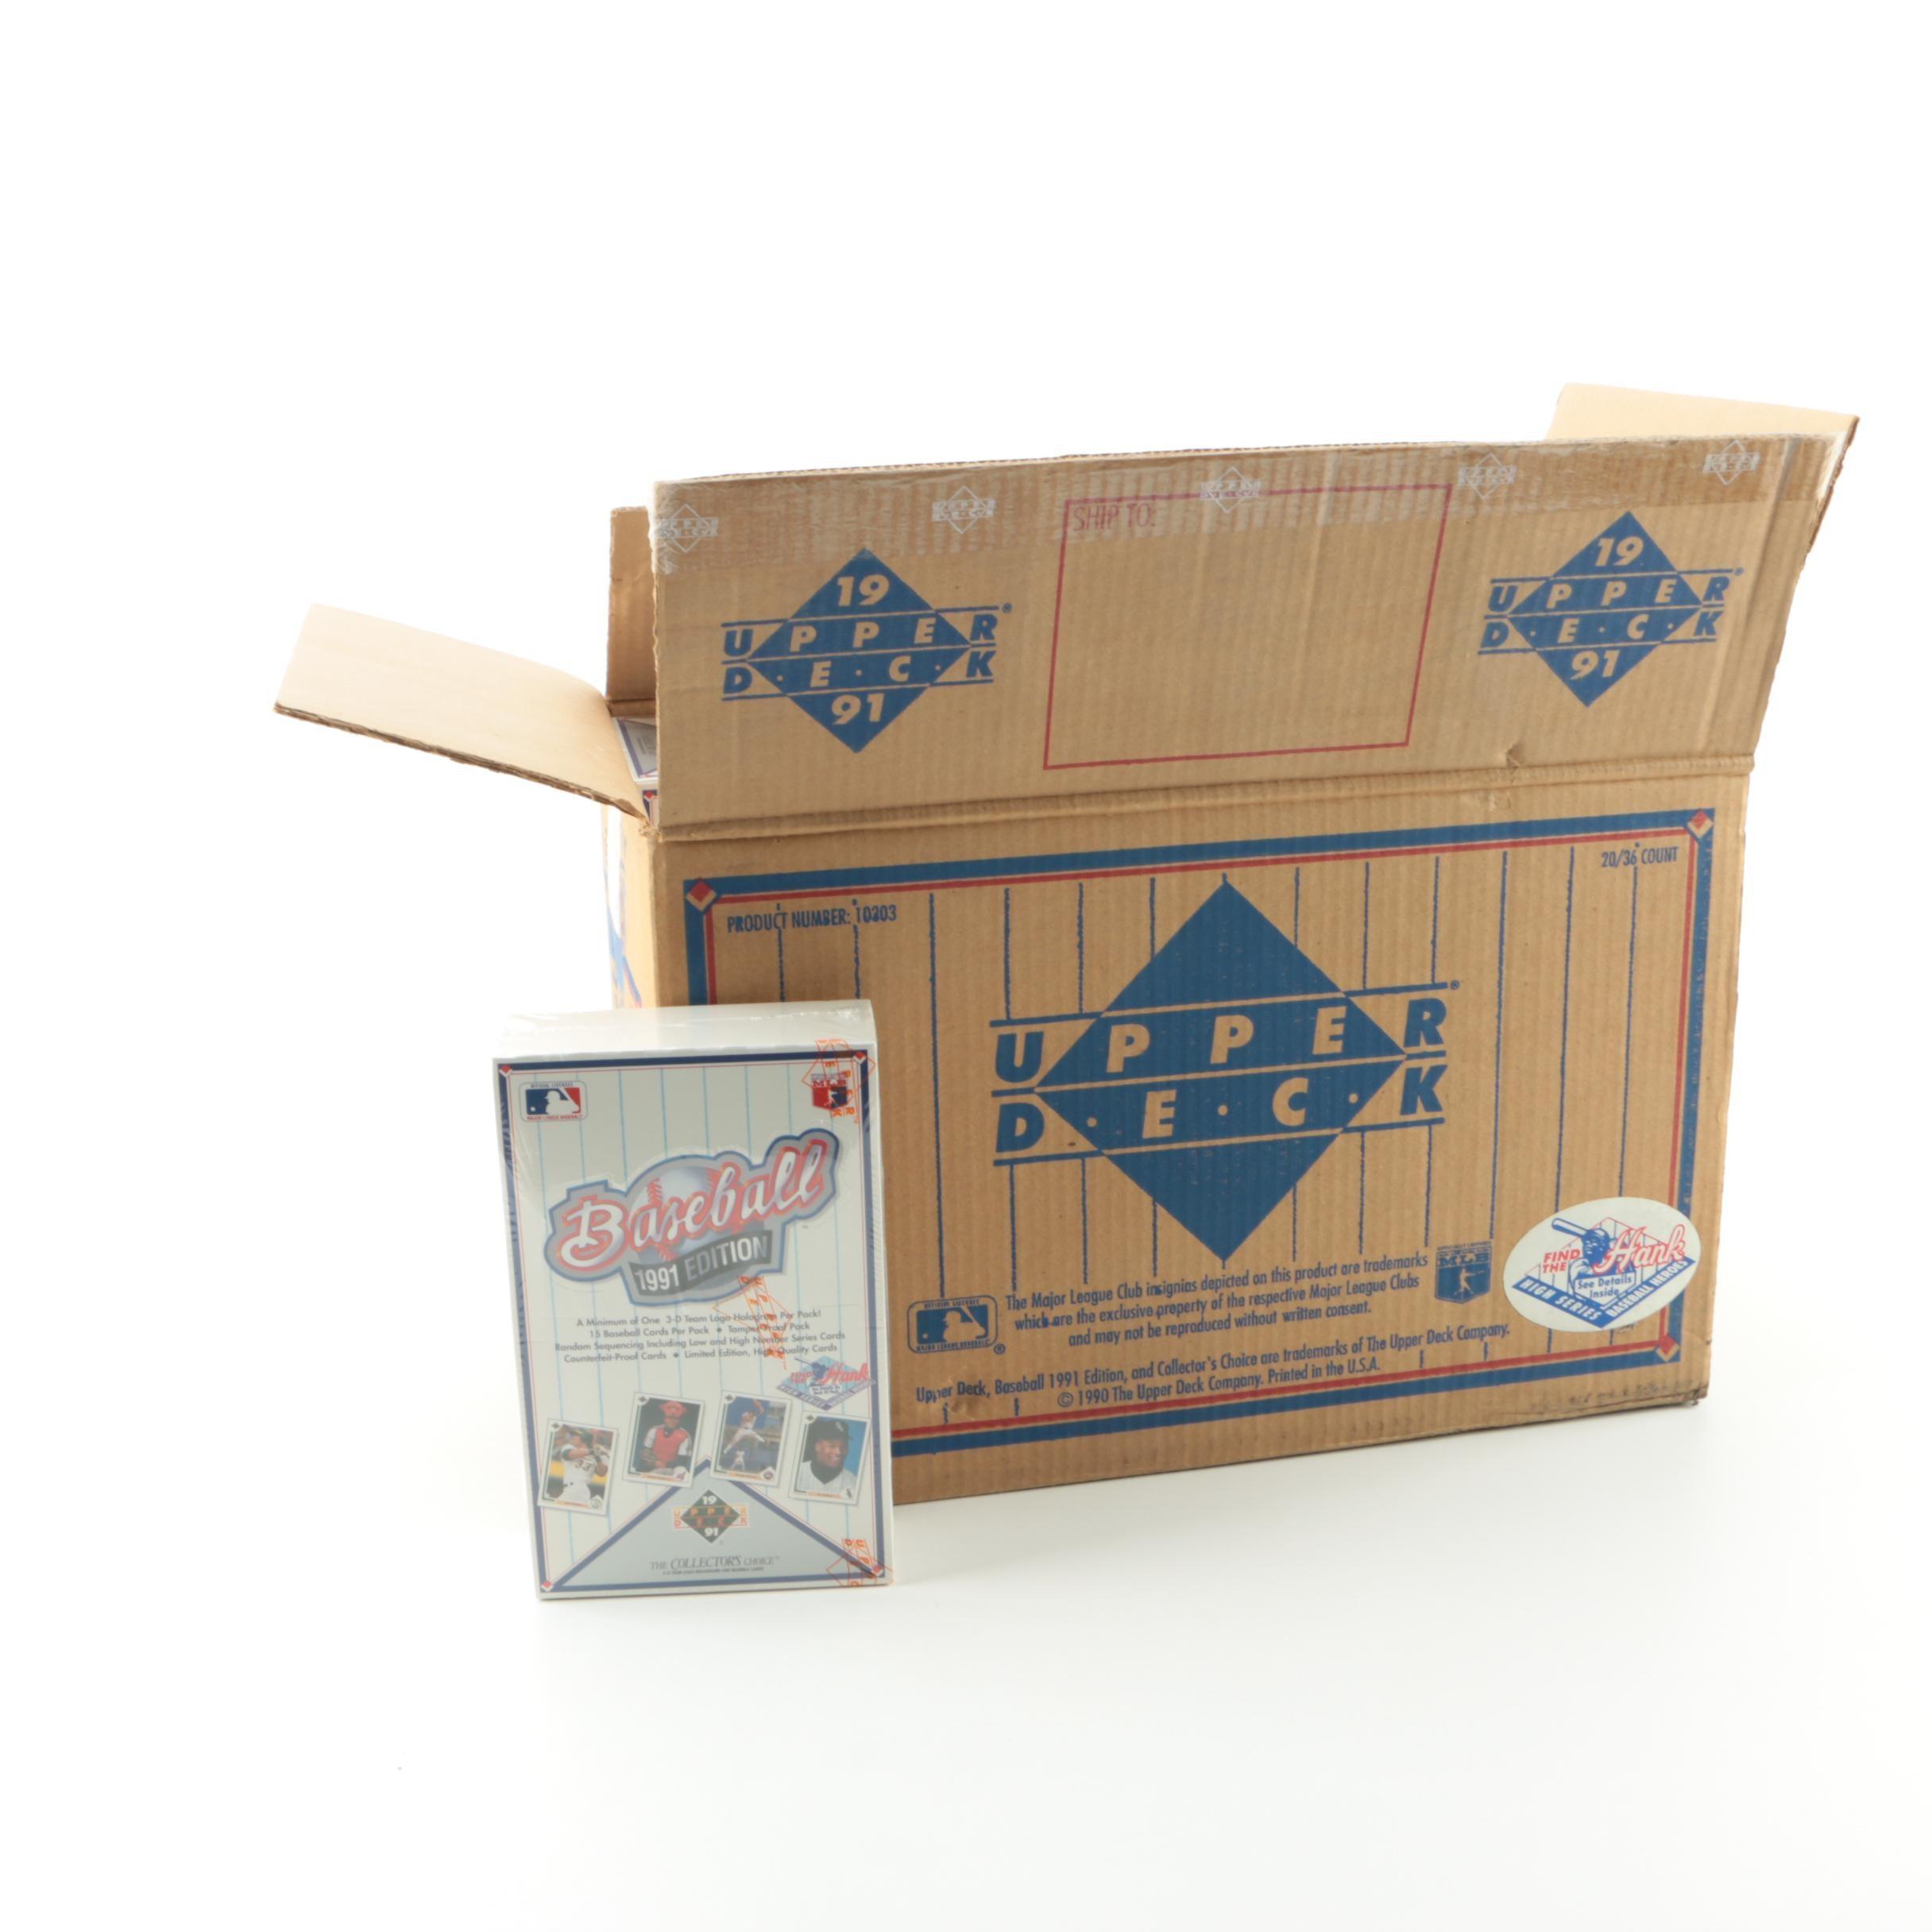 1991 Upper Deck Baseball Cards